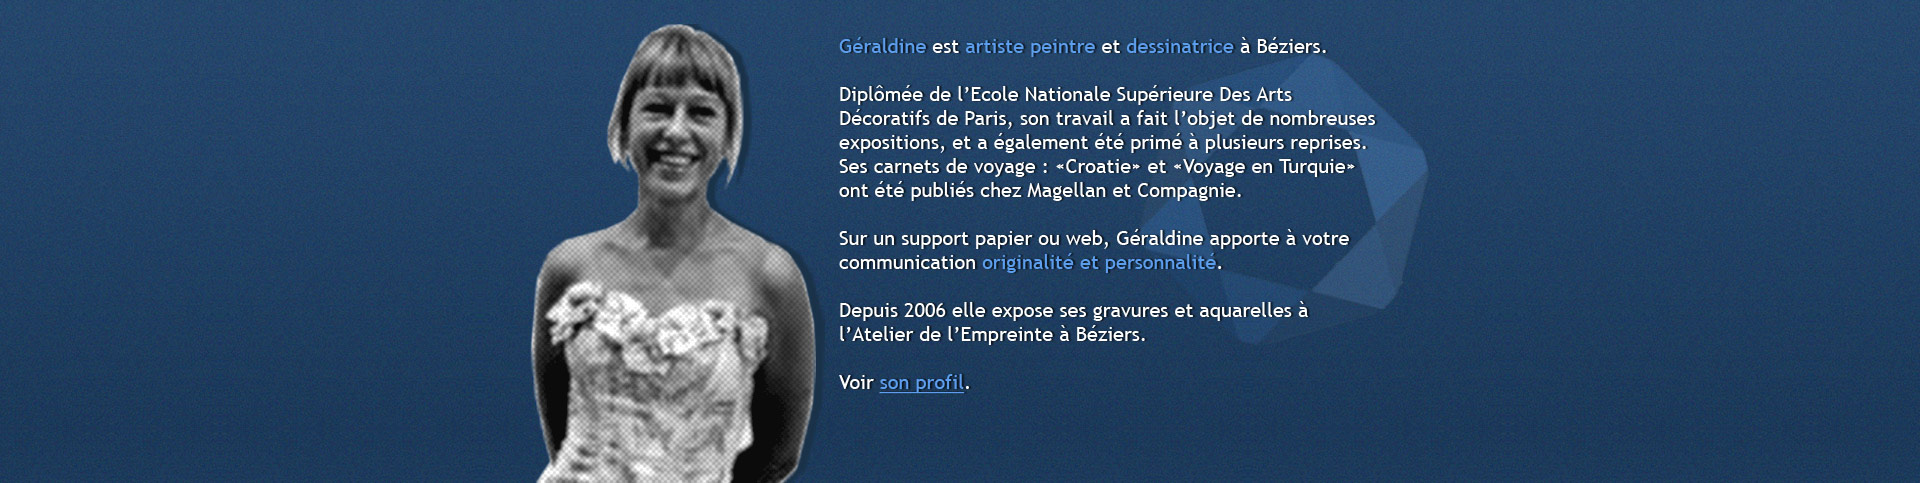 geraldine-dessinatrice-peintre